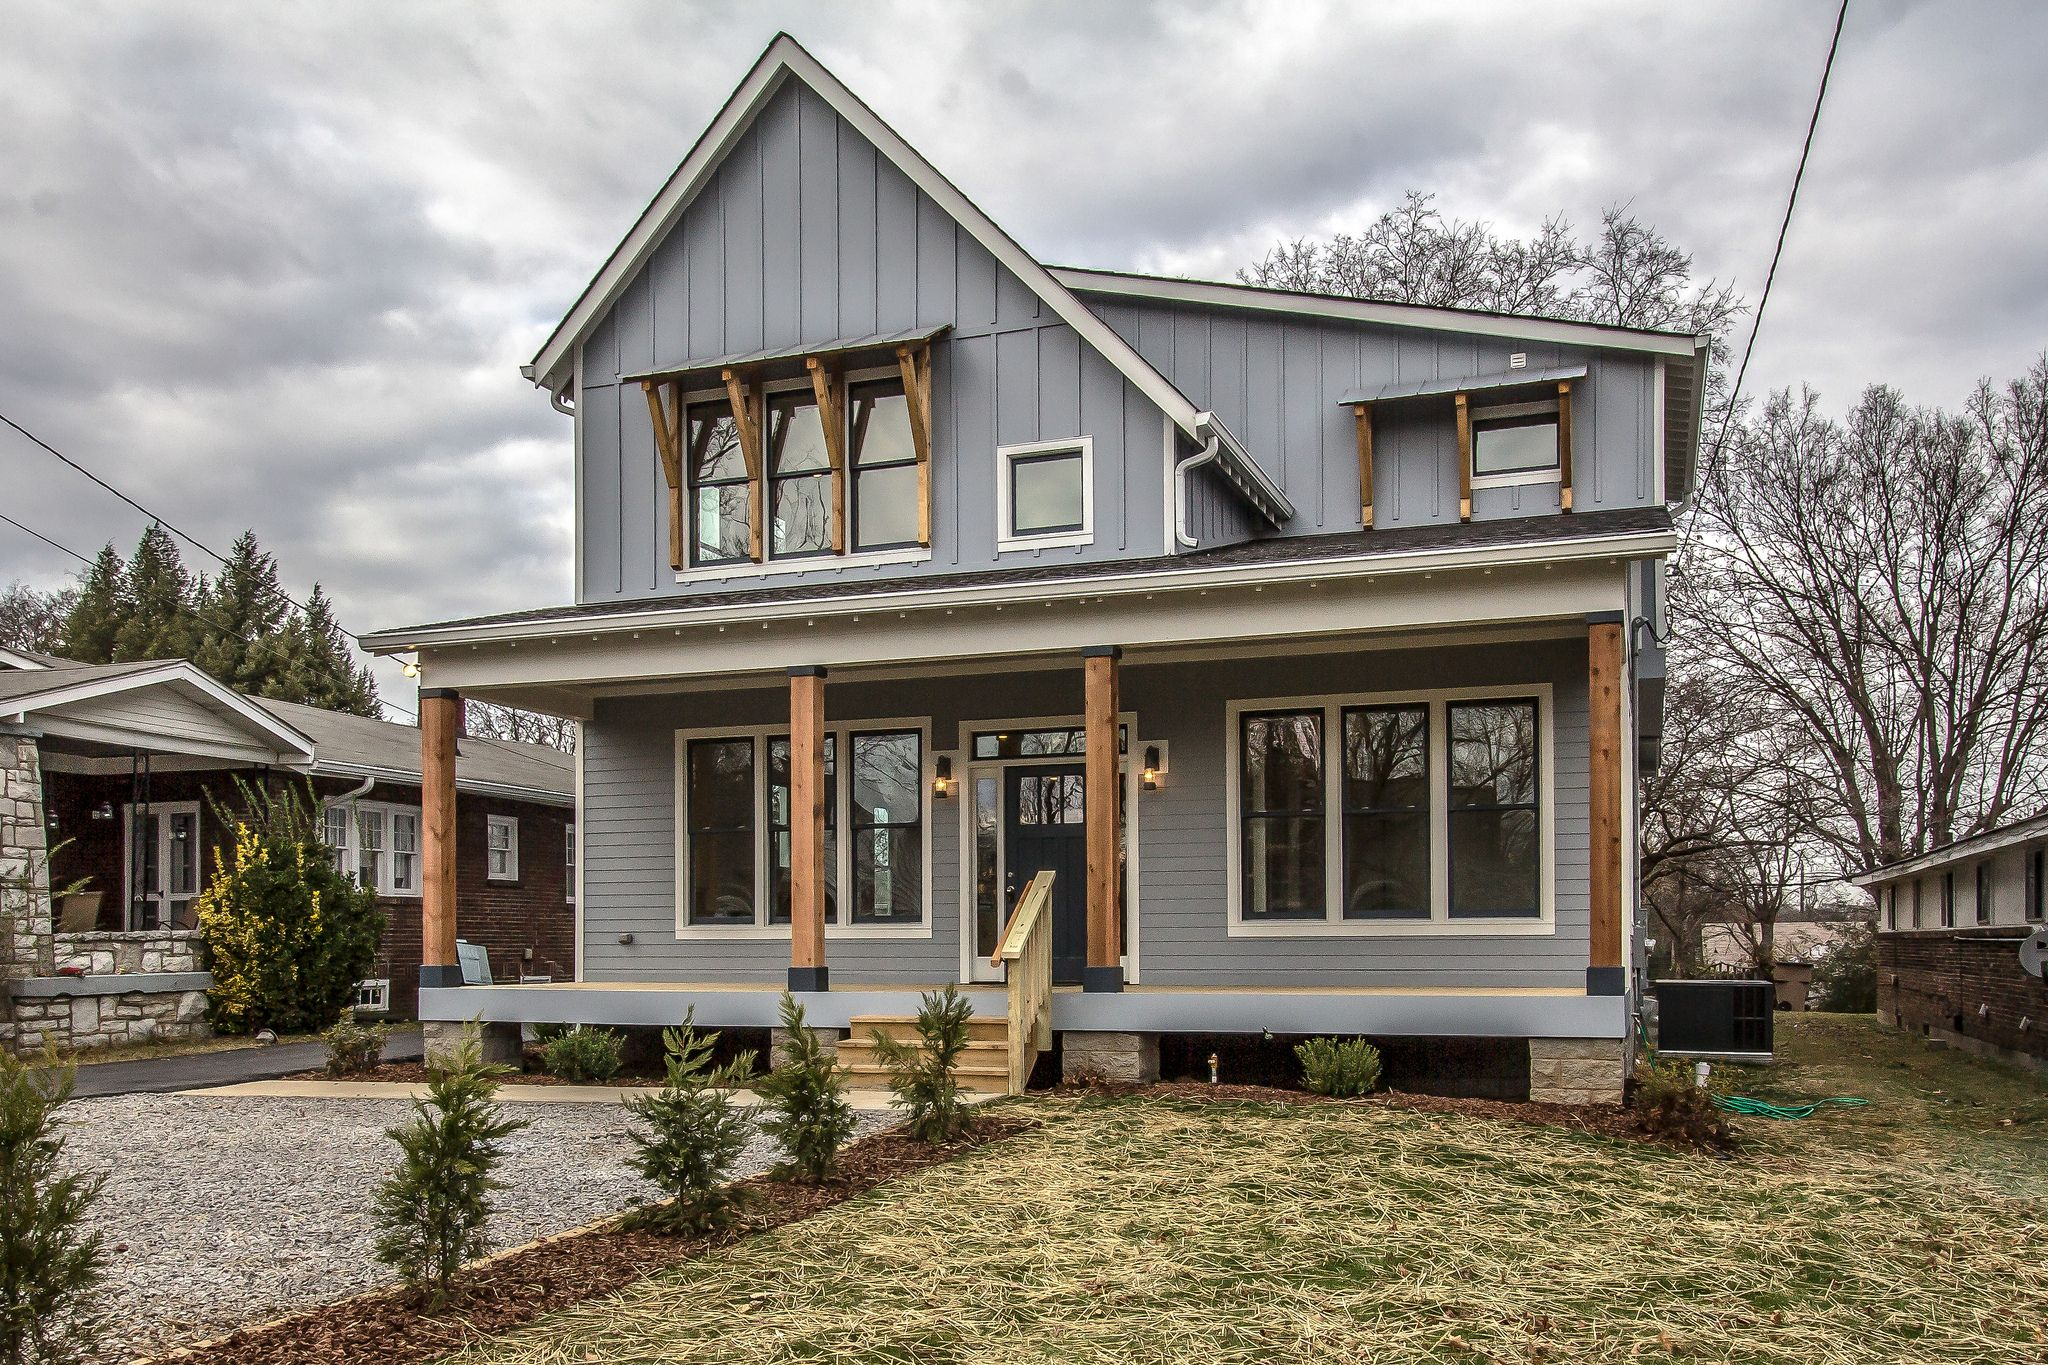 Urban Farmhouse Exterior | Urban farmhouse, House and Building ideas for Urban Farmhouse Architecture  157uhy